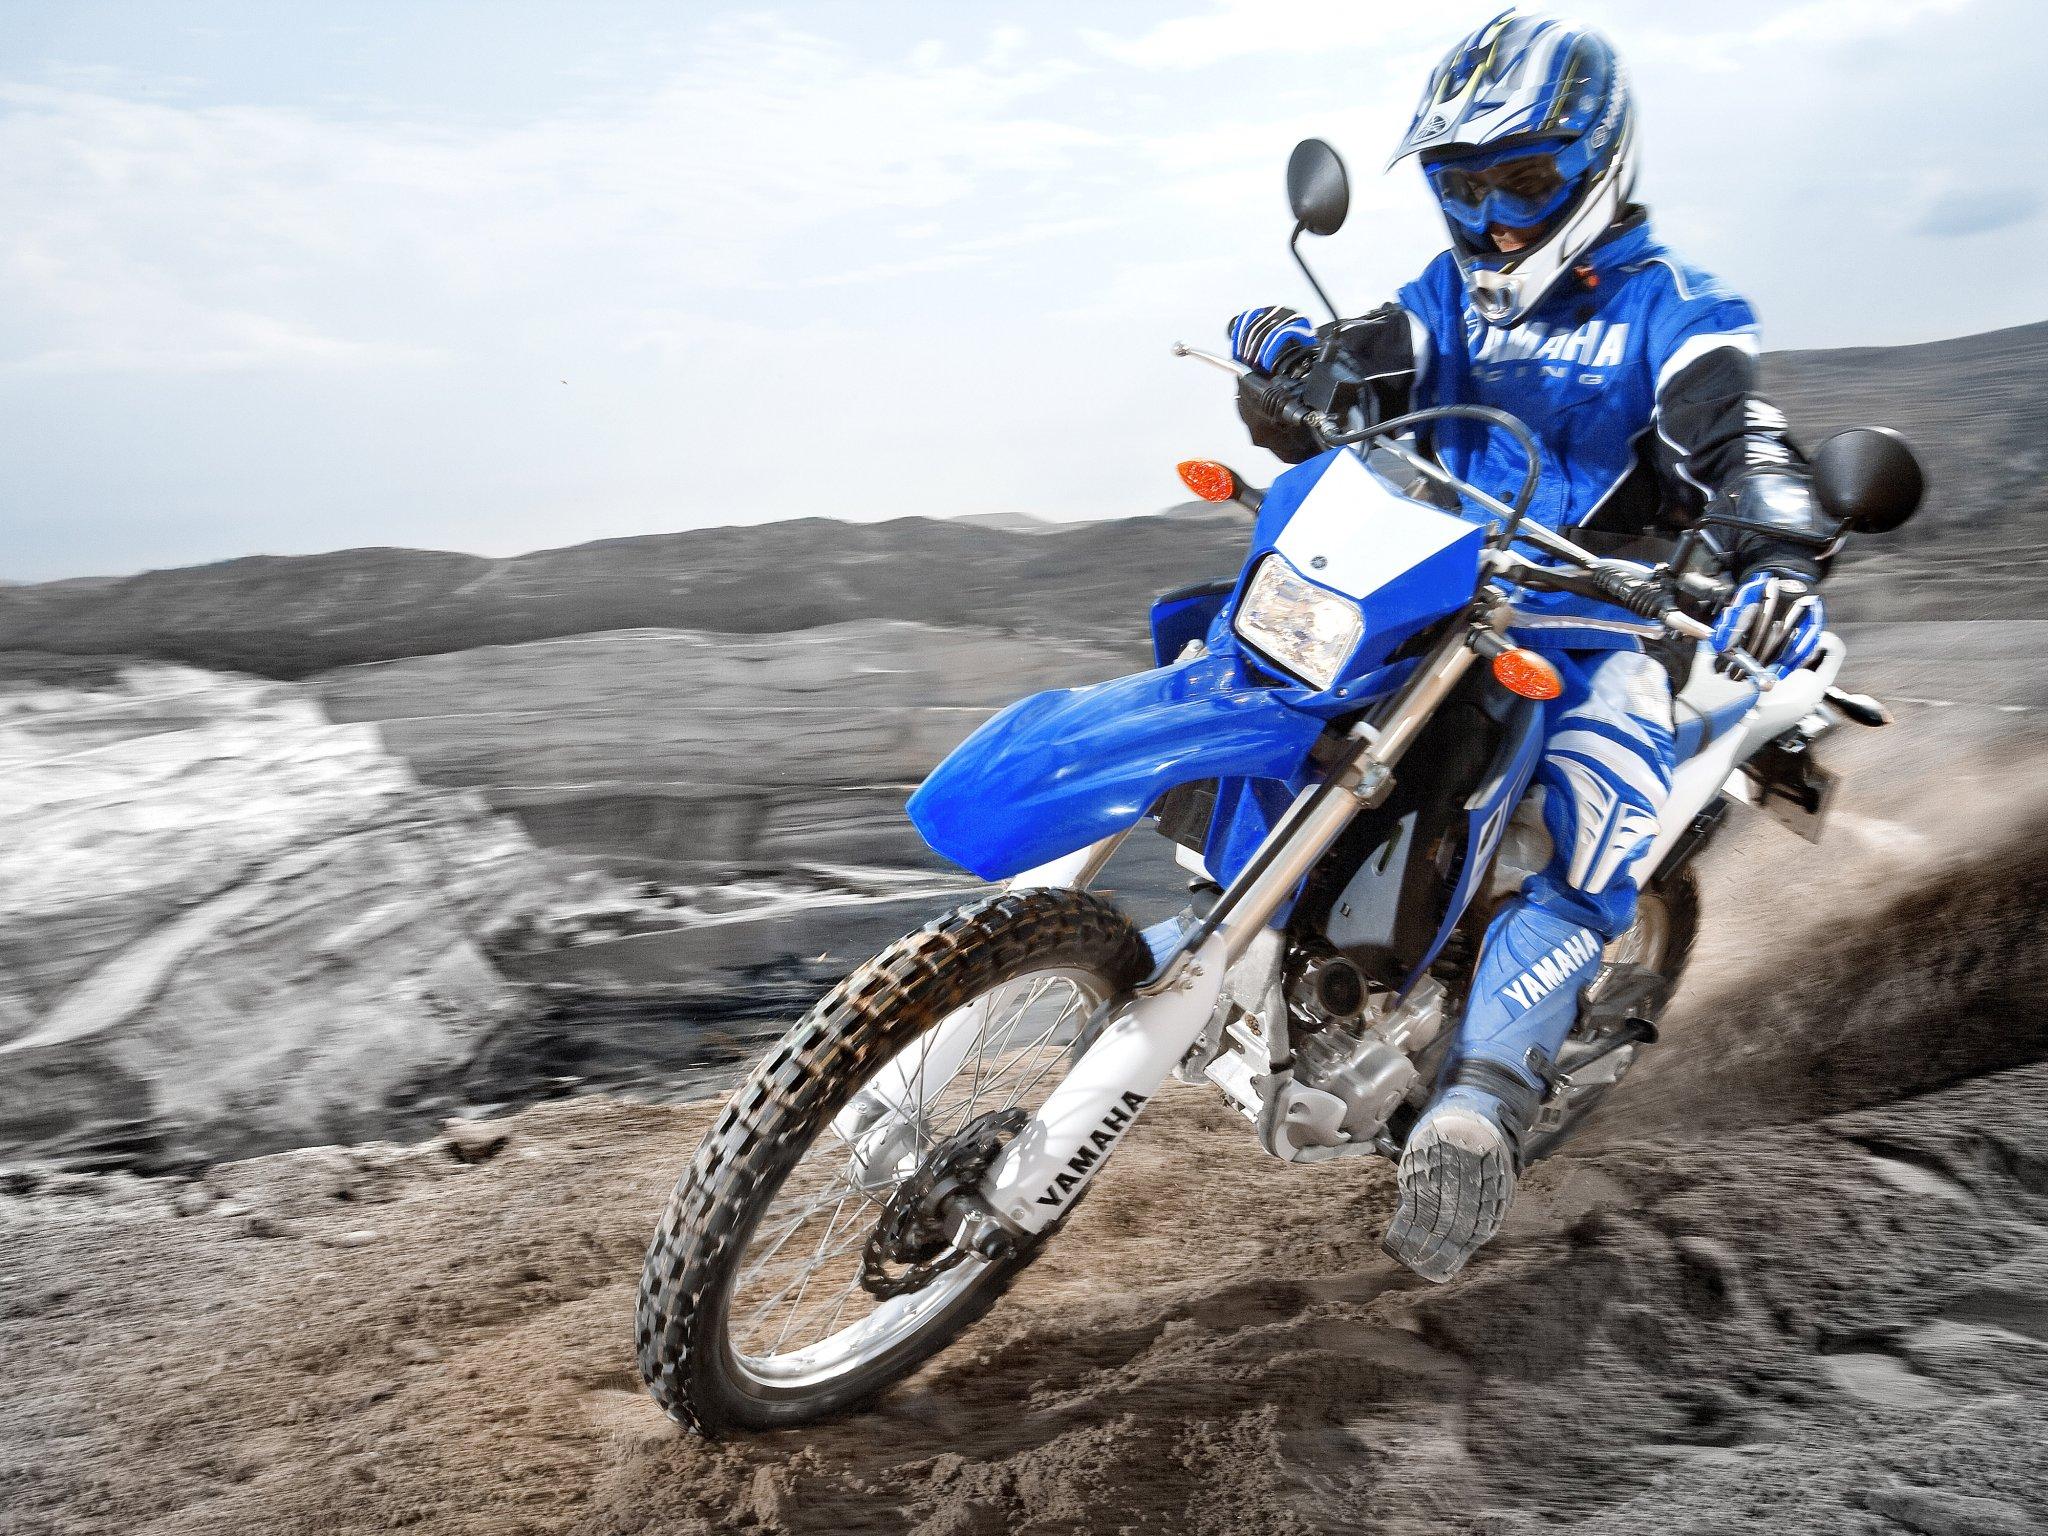 Motorrad Occasion kaufen YAMAHA FZ 1 SA ABS Motoria GmbH